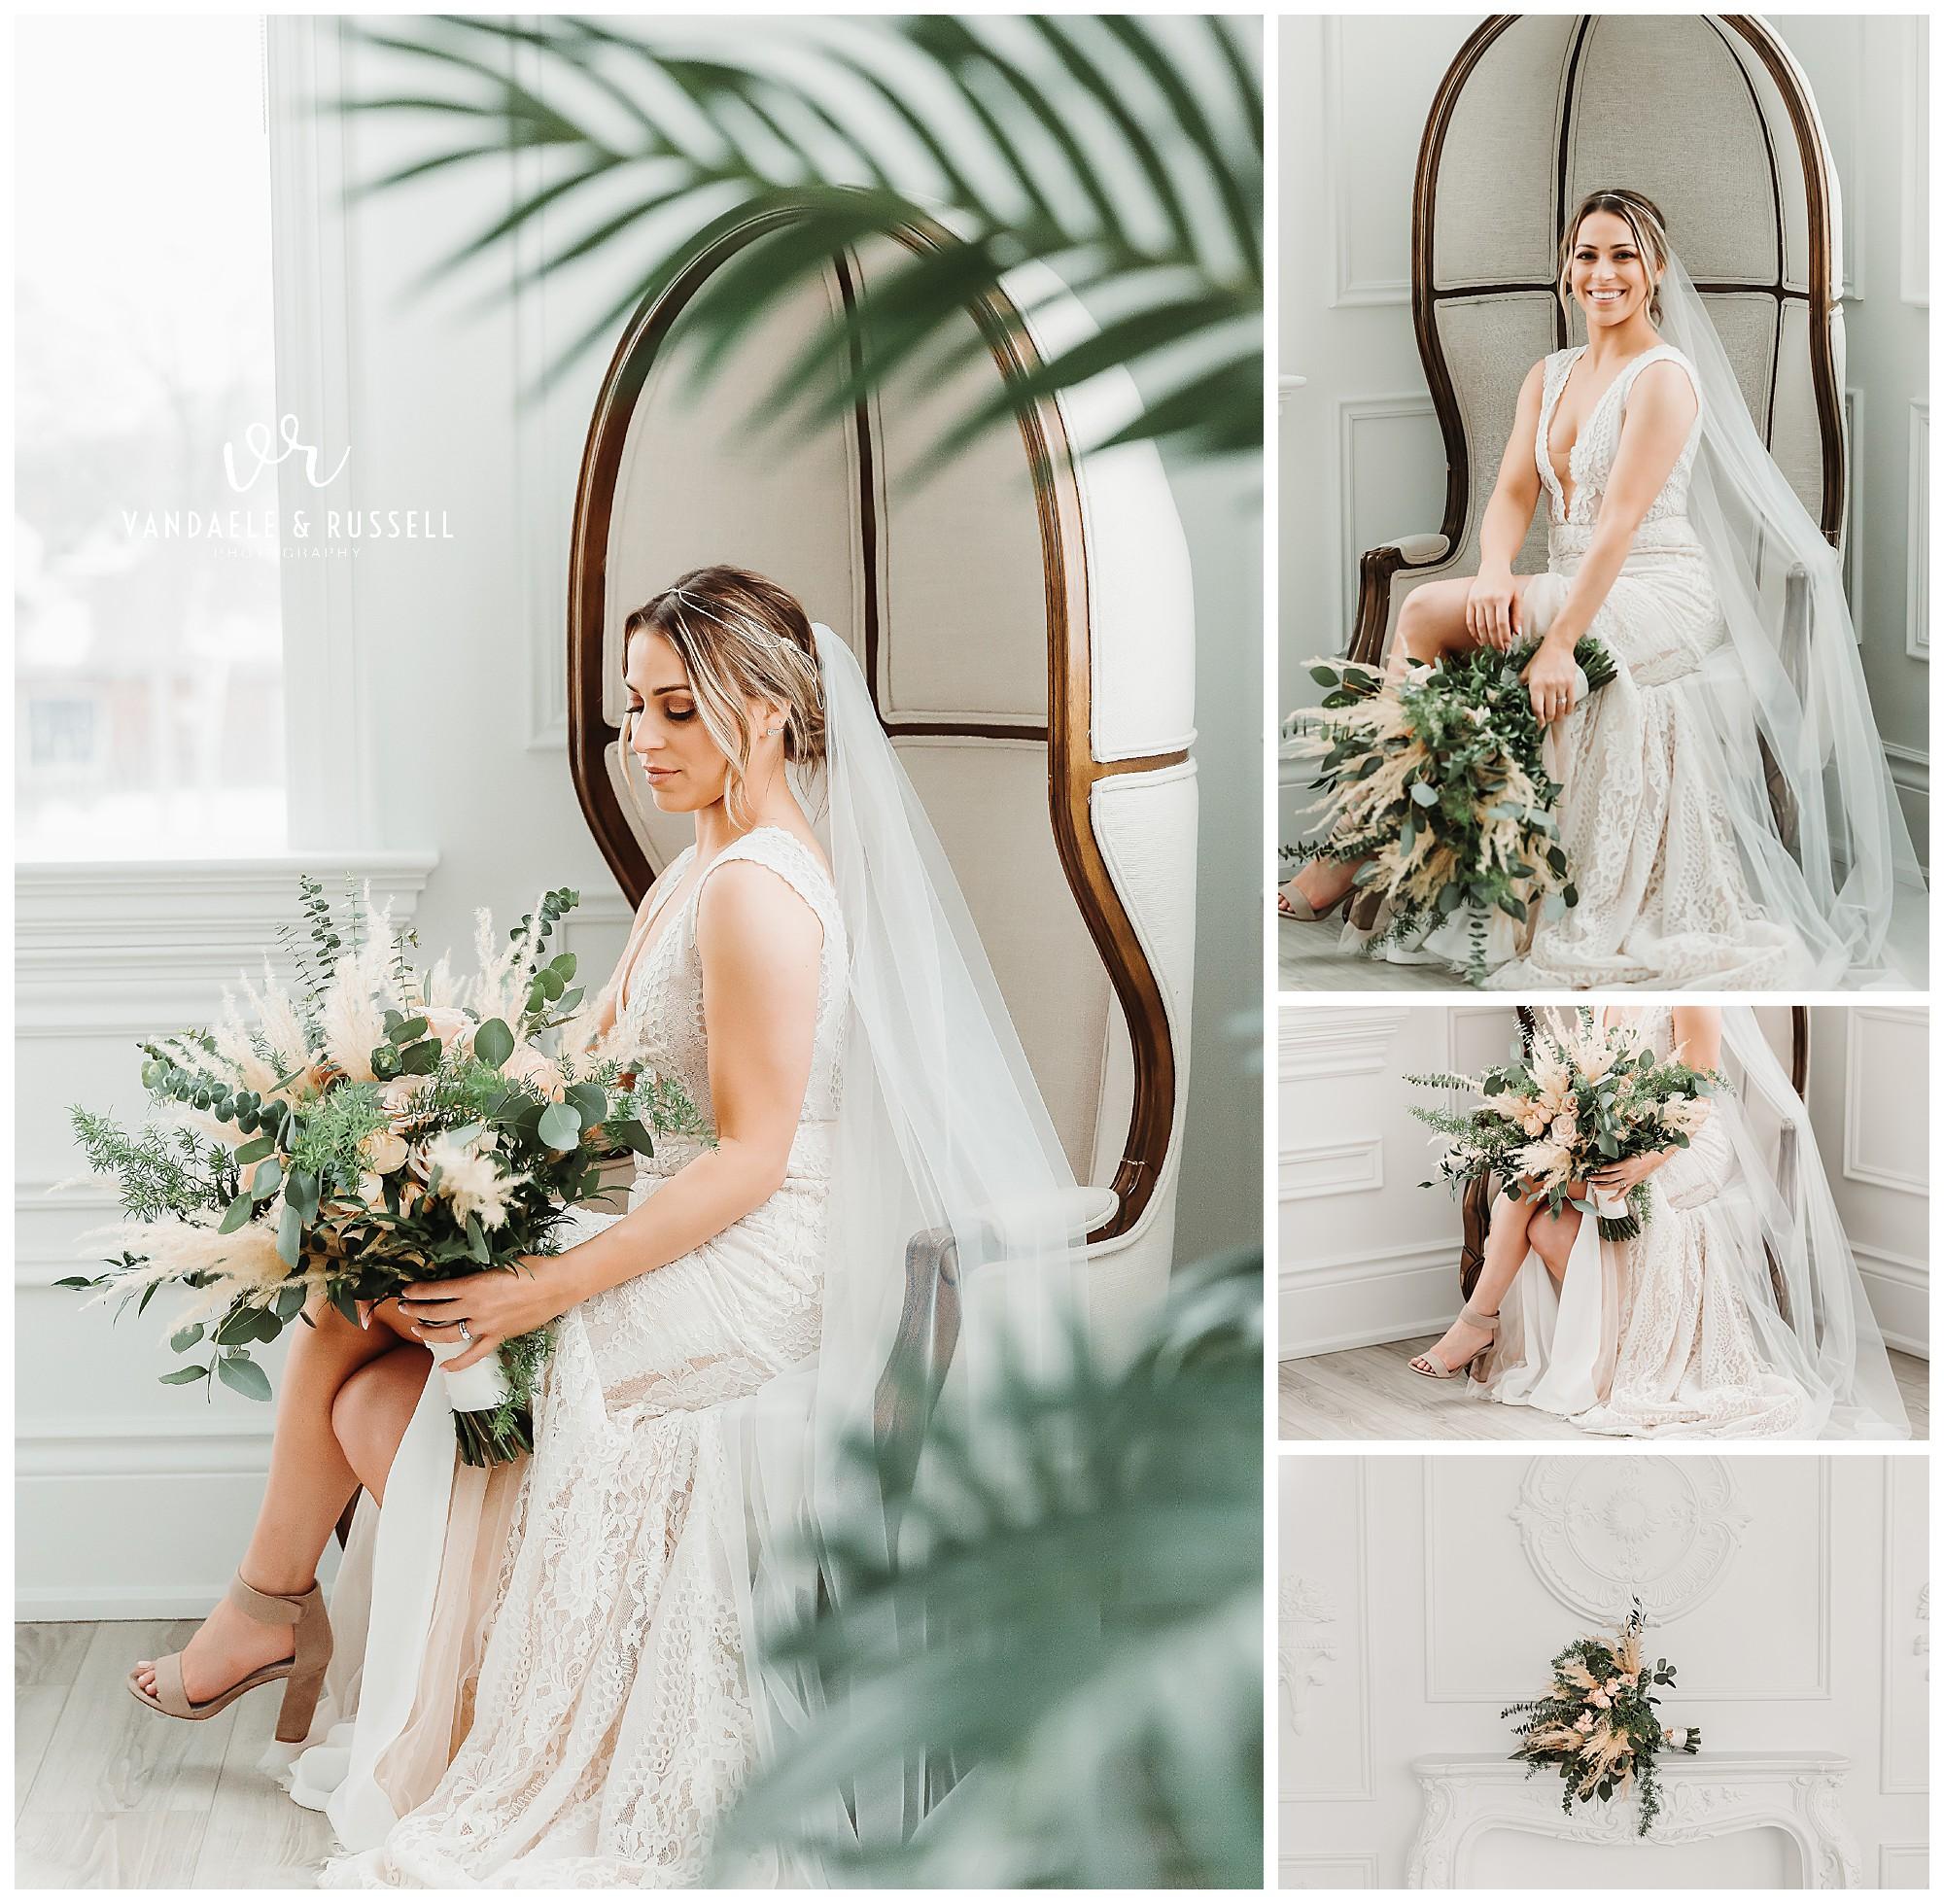 Joanna-Christos-Grand-Luxe-Wedding-Photos-Mint-Room-Toronto-VanDaele-Russell_0093.jpg